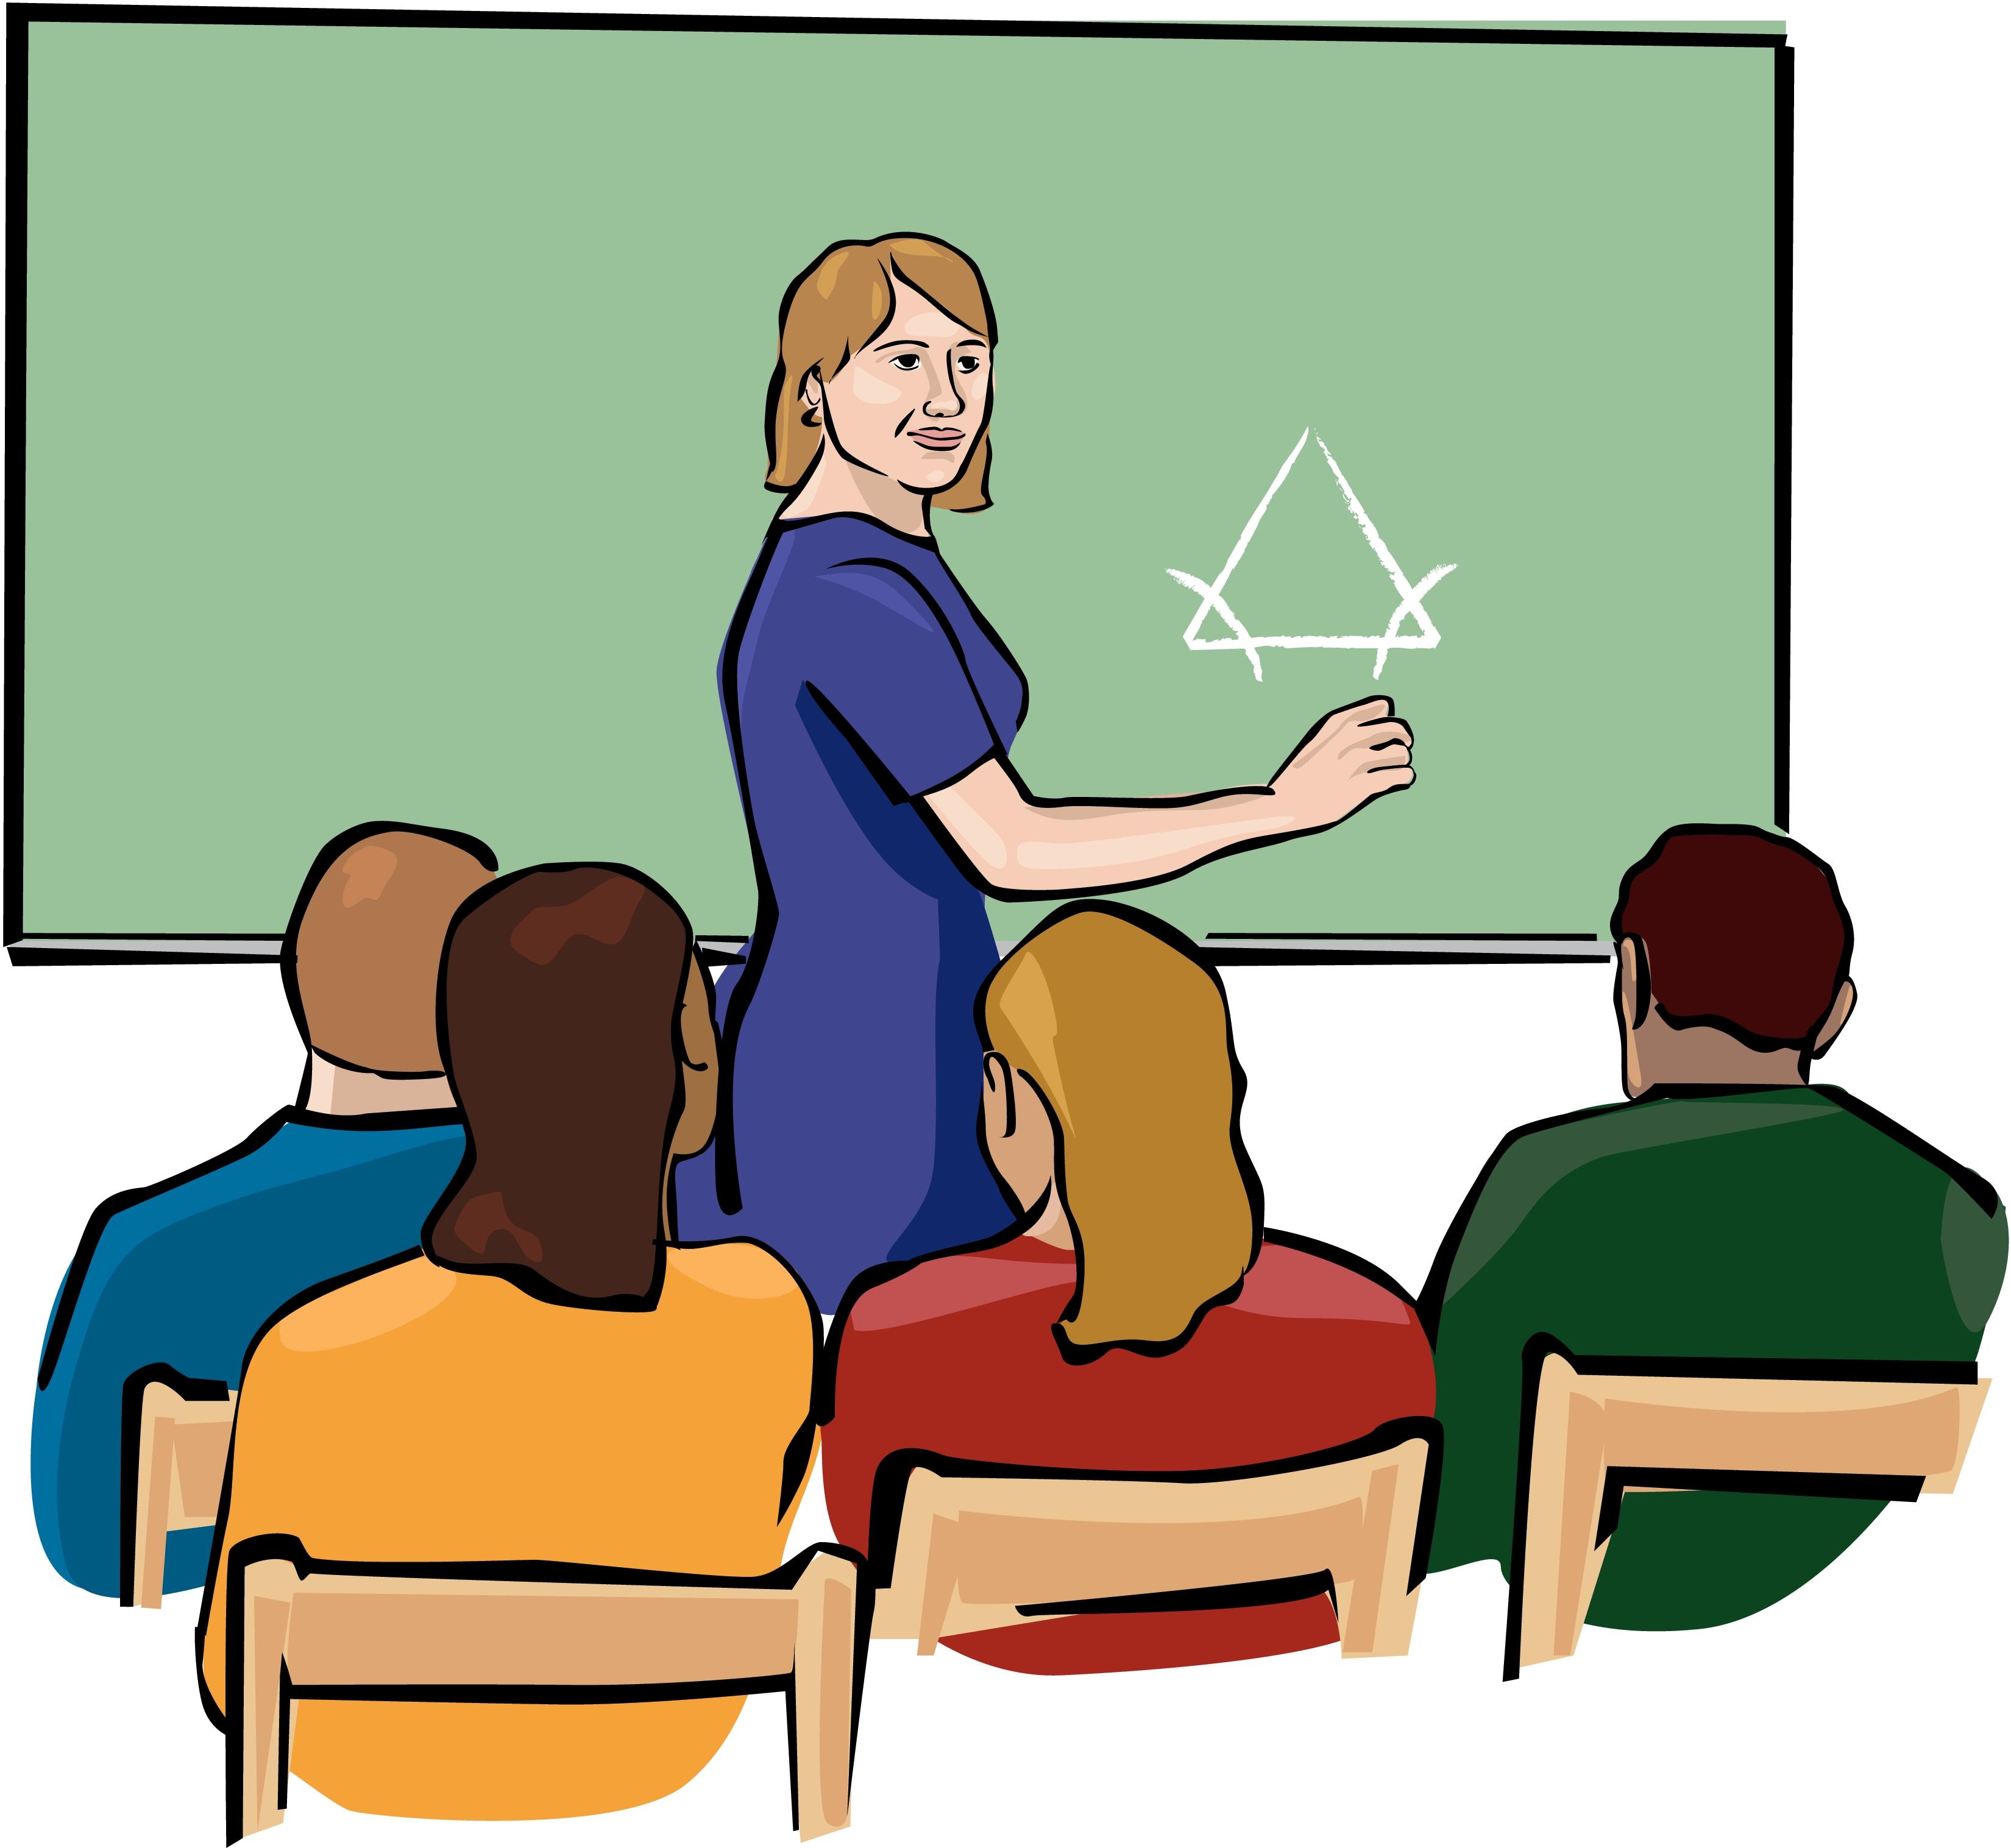 Teacher teaching students clipart vector stock Teacher Teaching Student Clip Art N10 free image vector stock